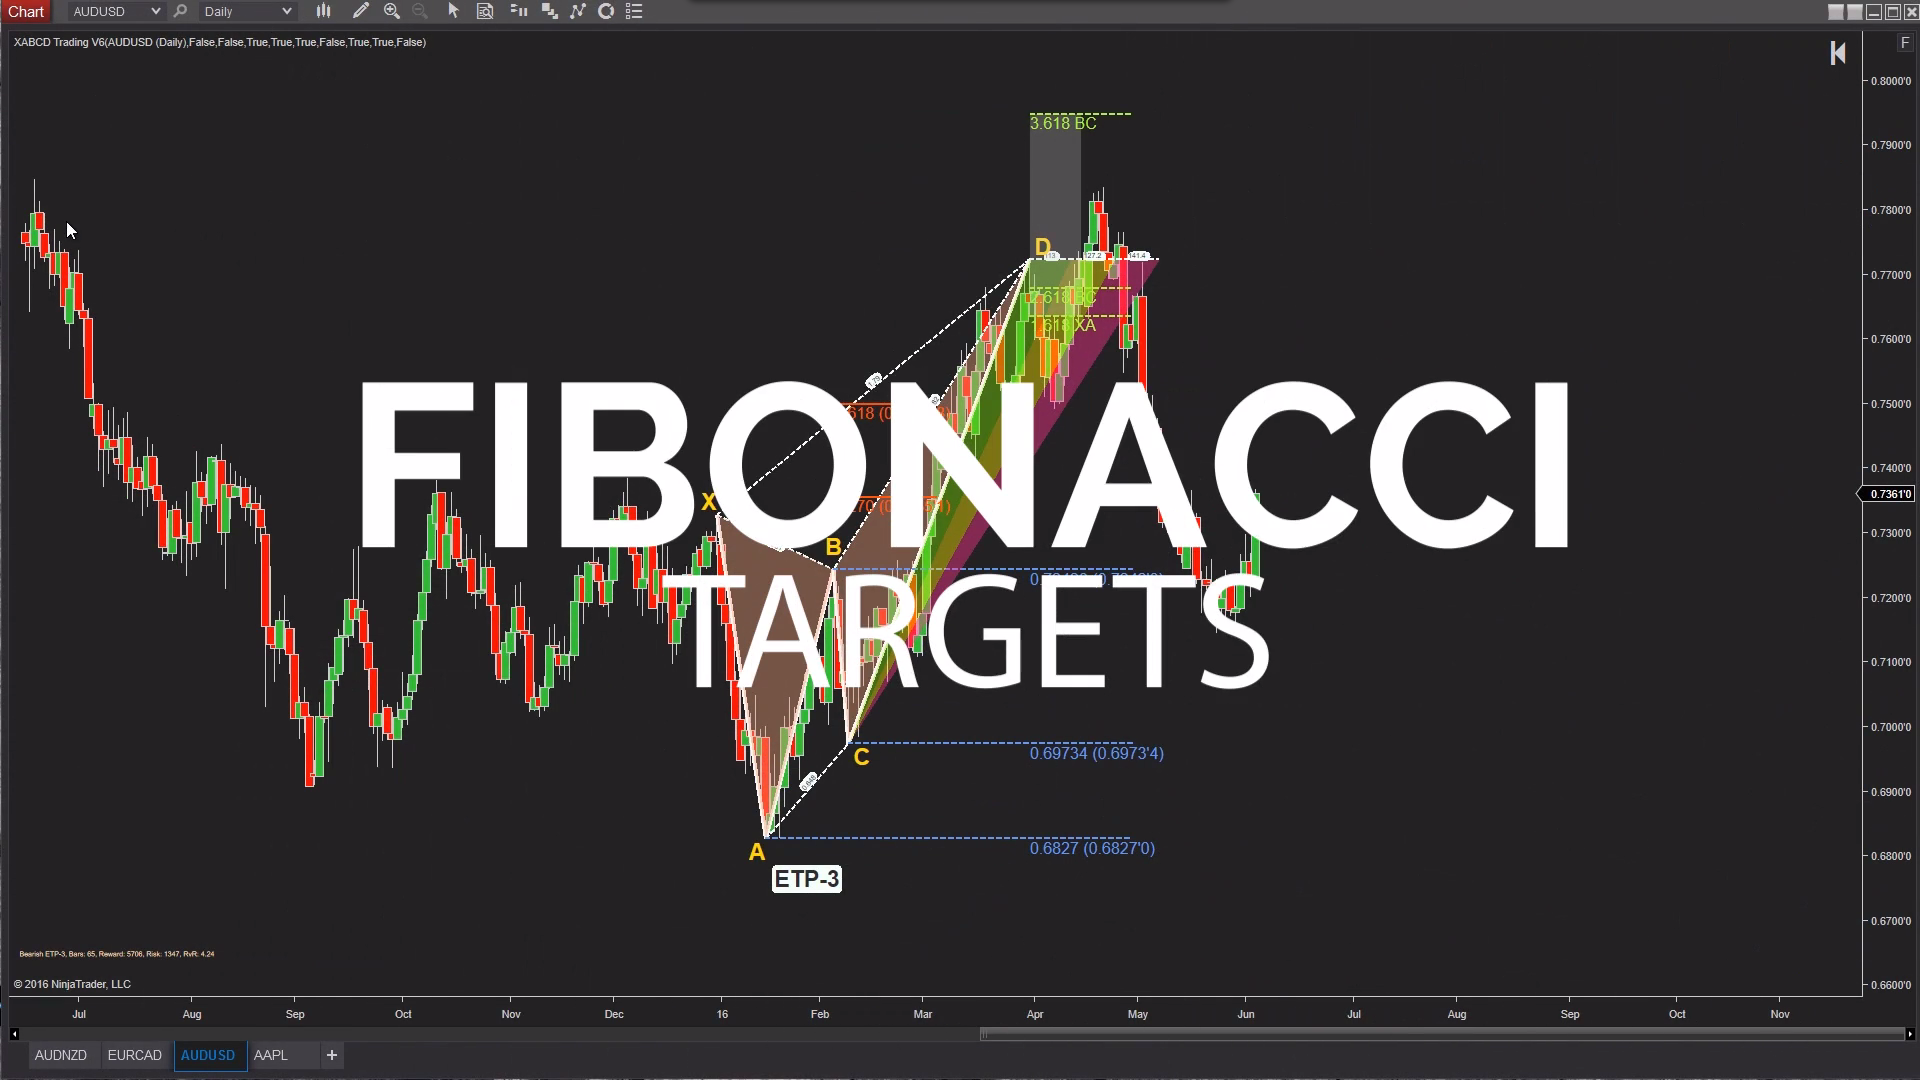 Fibonacci Targets